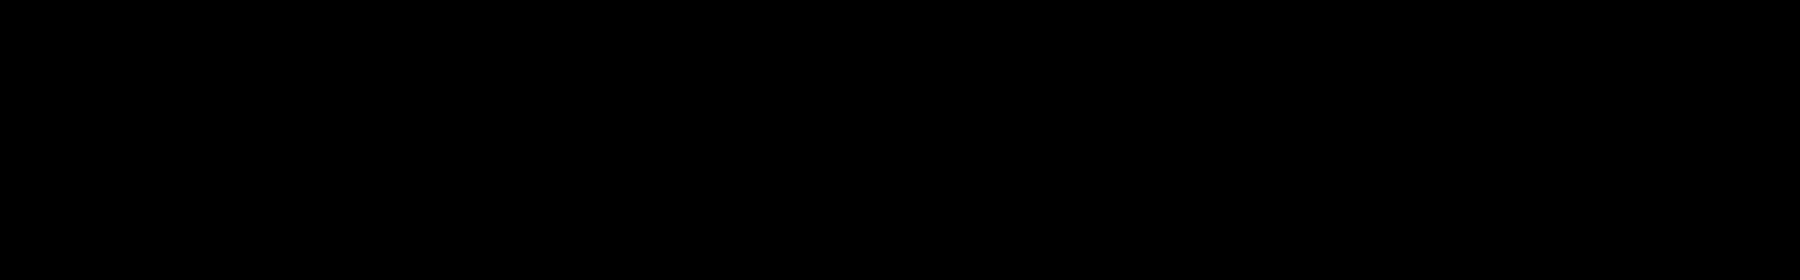 Carpe Drill audio waveform